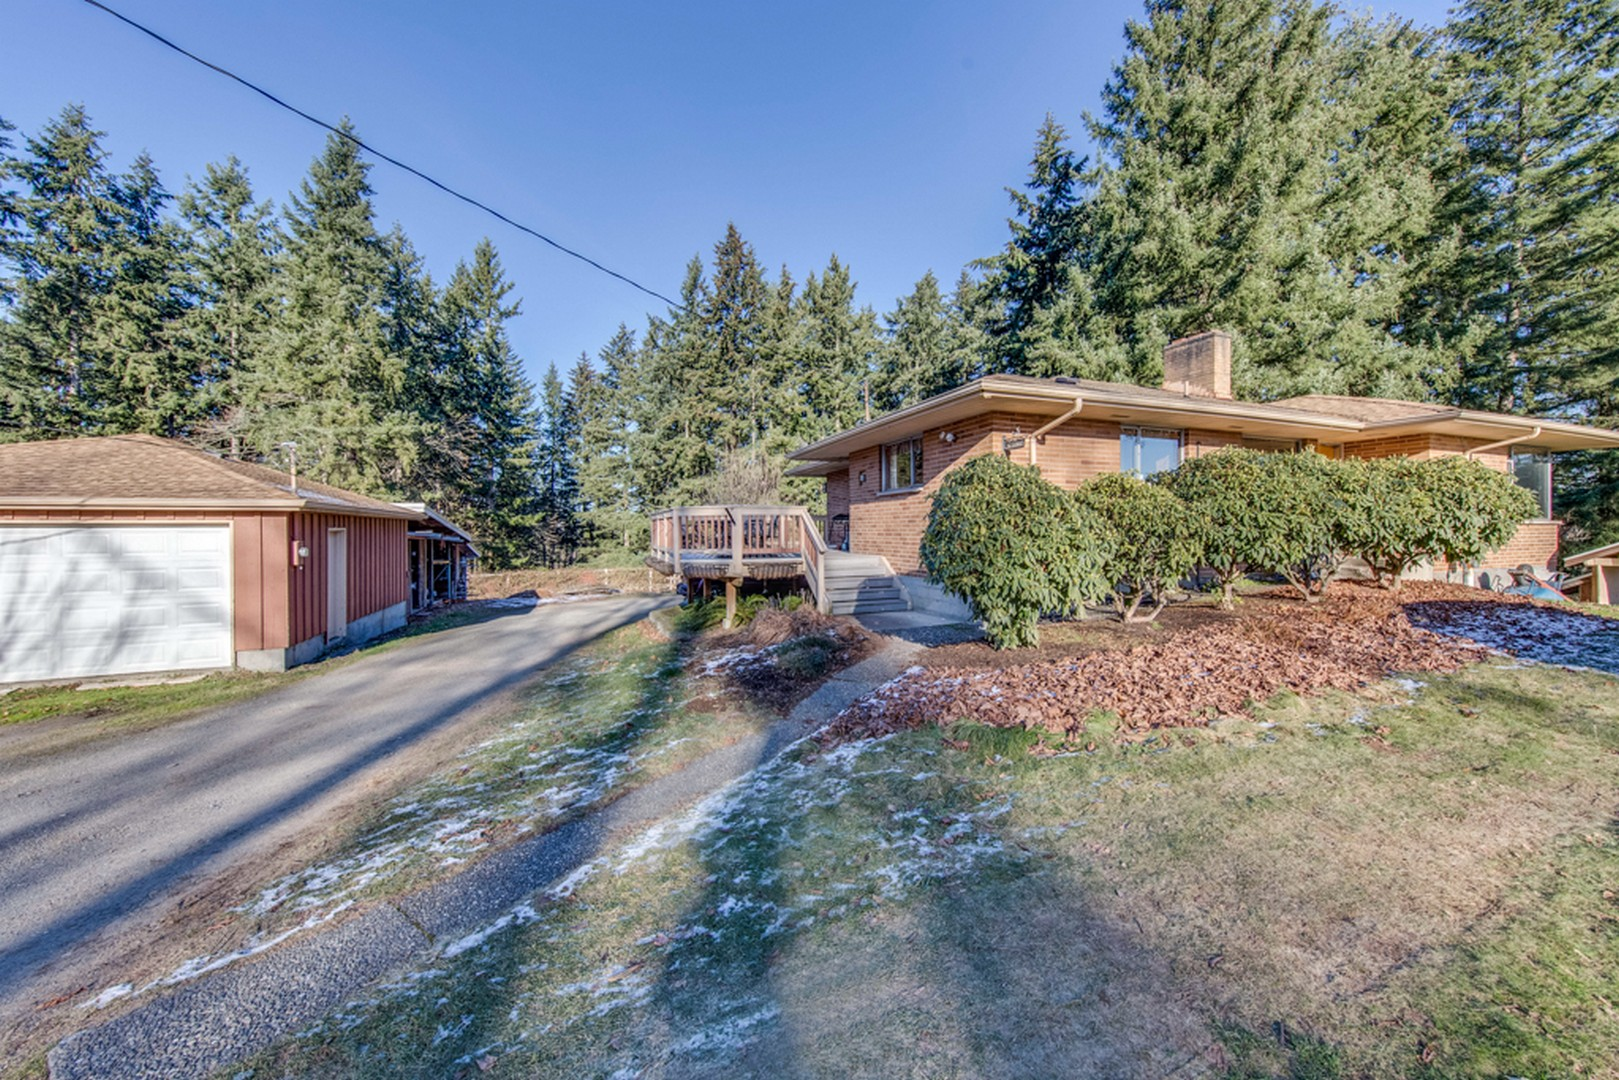 Single Family Home for Sale at Land Bank 12206 SE 188th St Renton, Washington 98058 United States